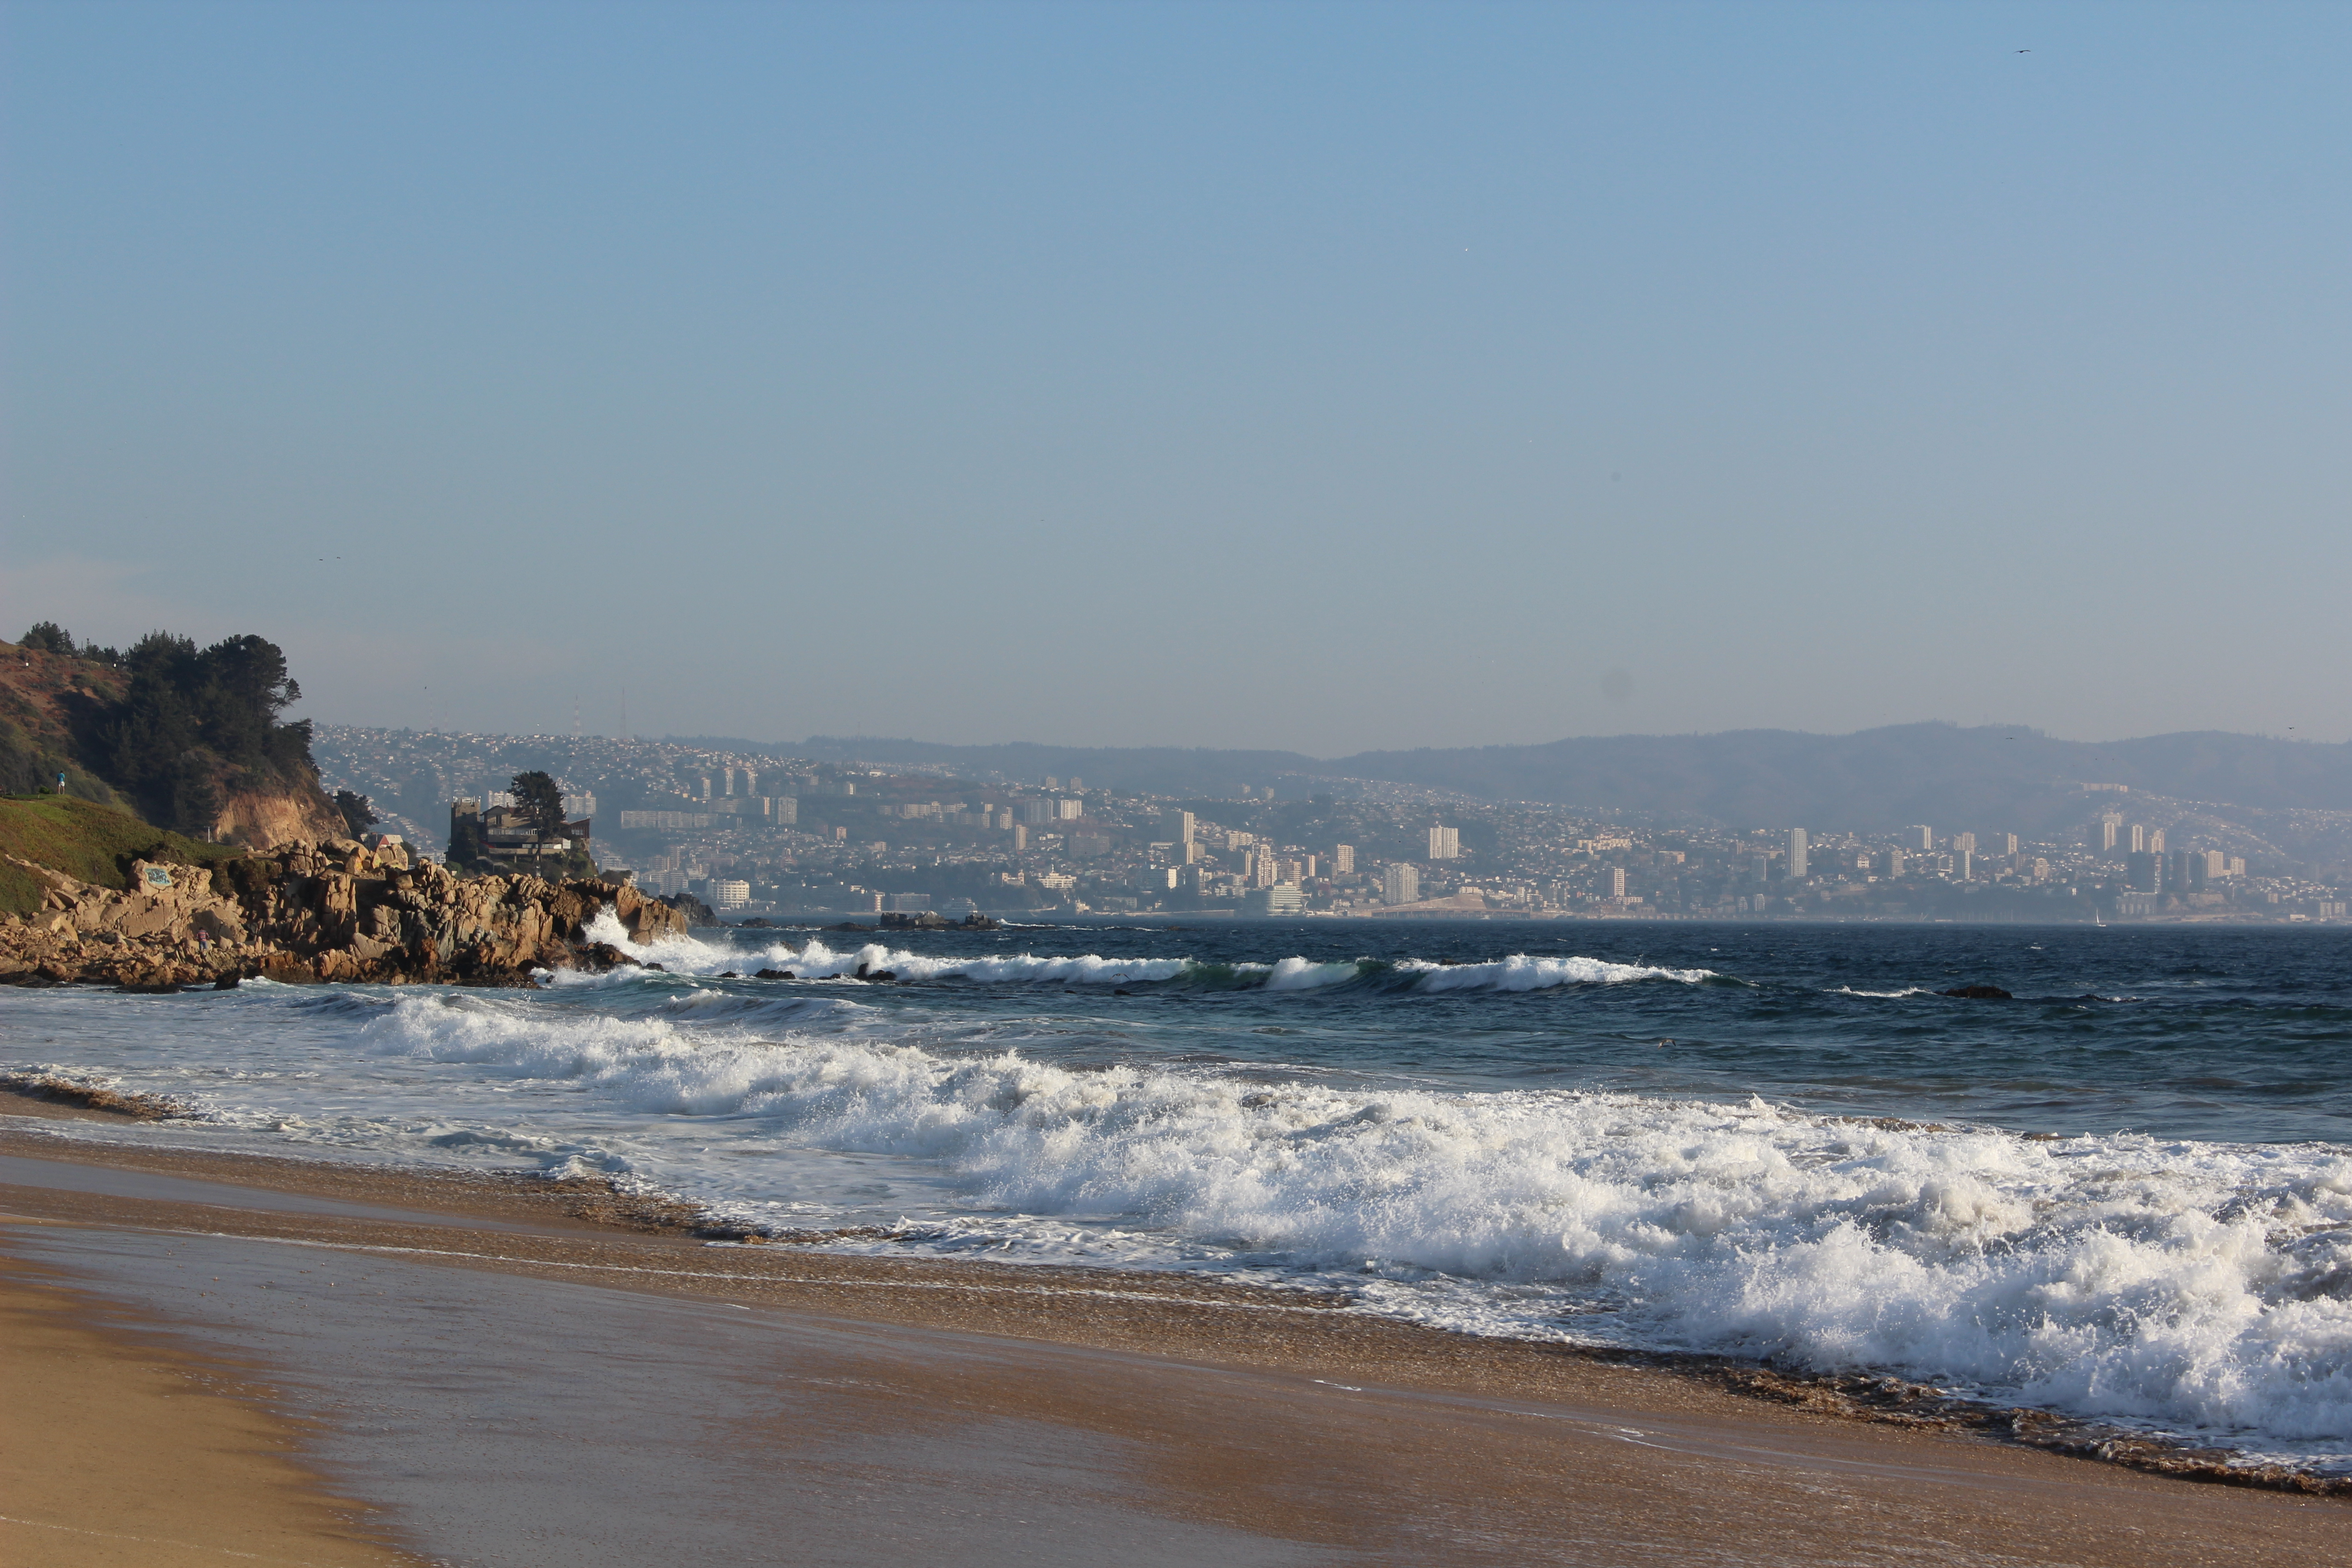 Pacific Ocean, Renaca, Vaparaiso, Chile